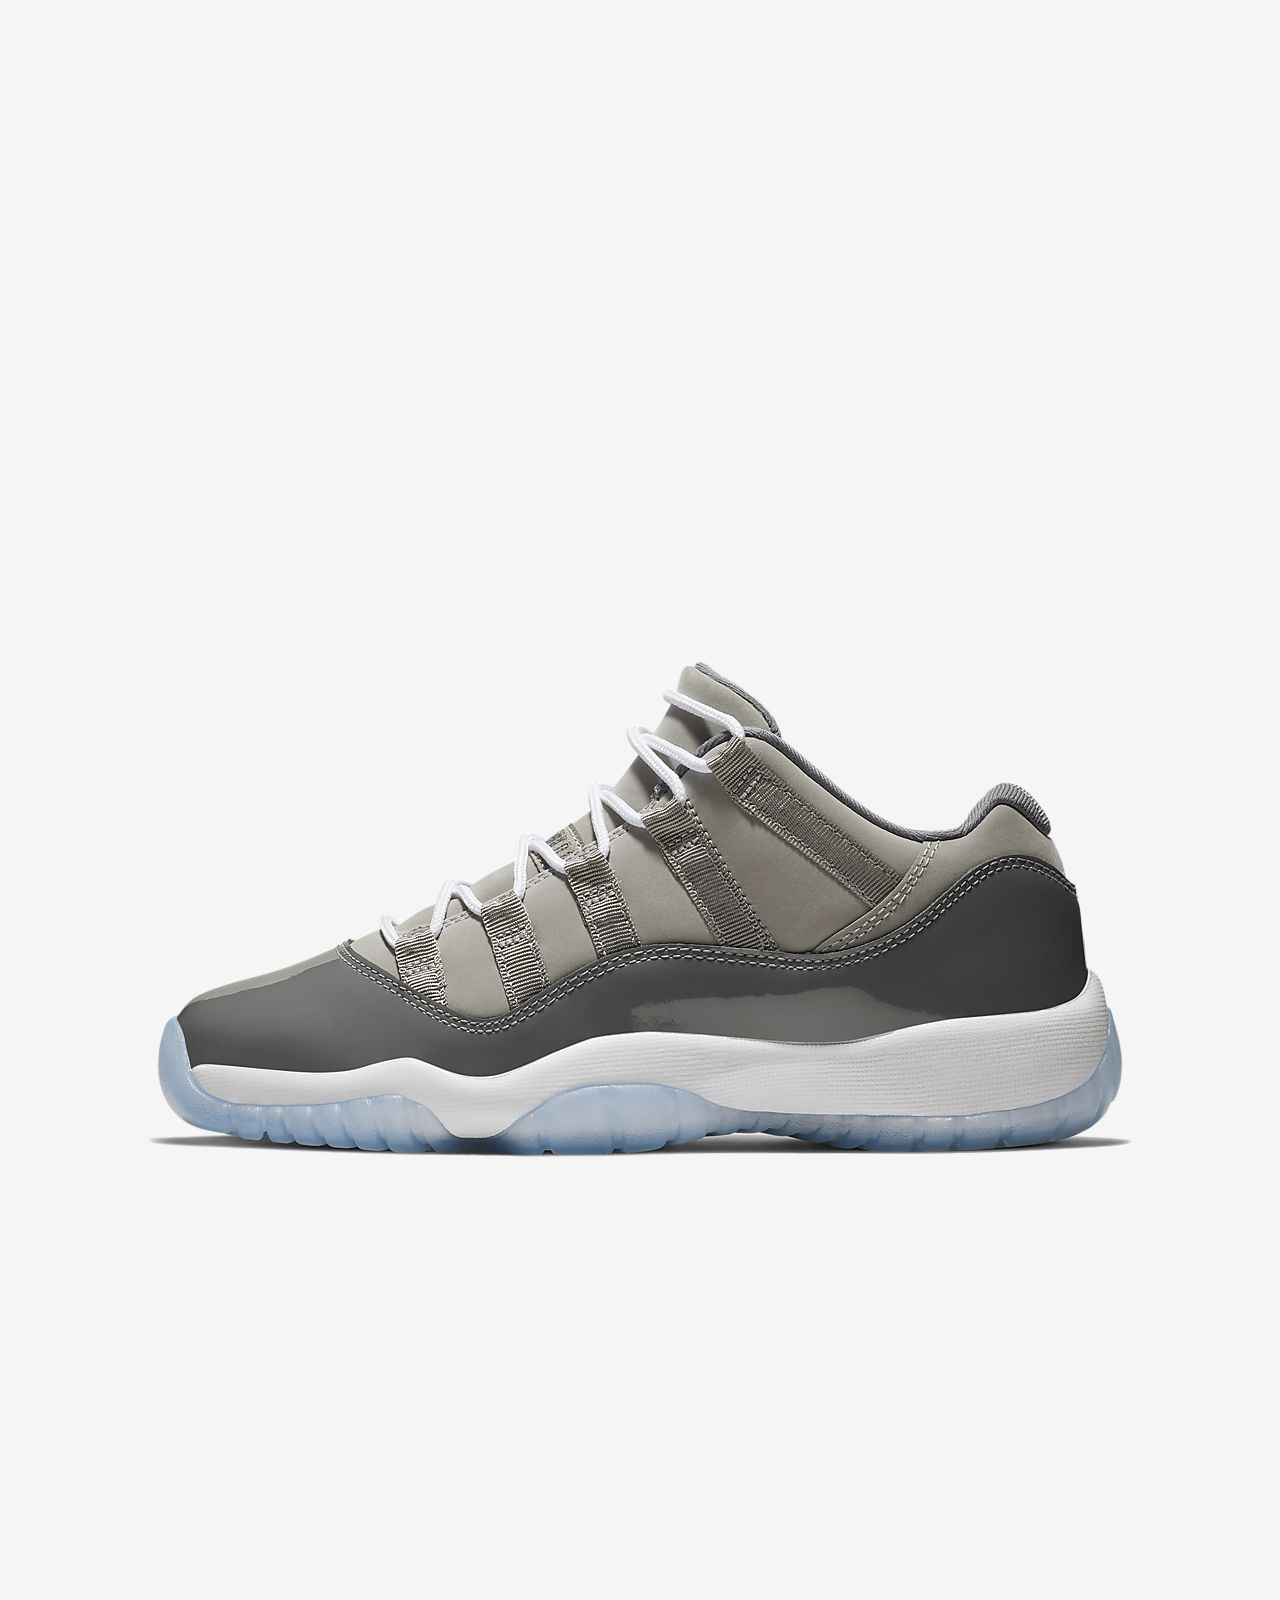 info for b4a89 1c7d4 Air Jordan 11 Retro Low Older Kids' Shoe